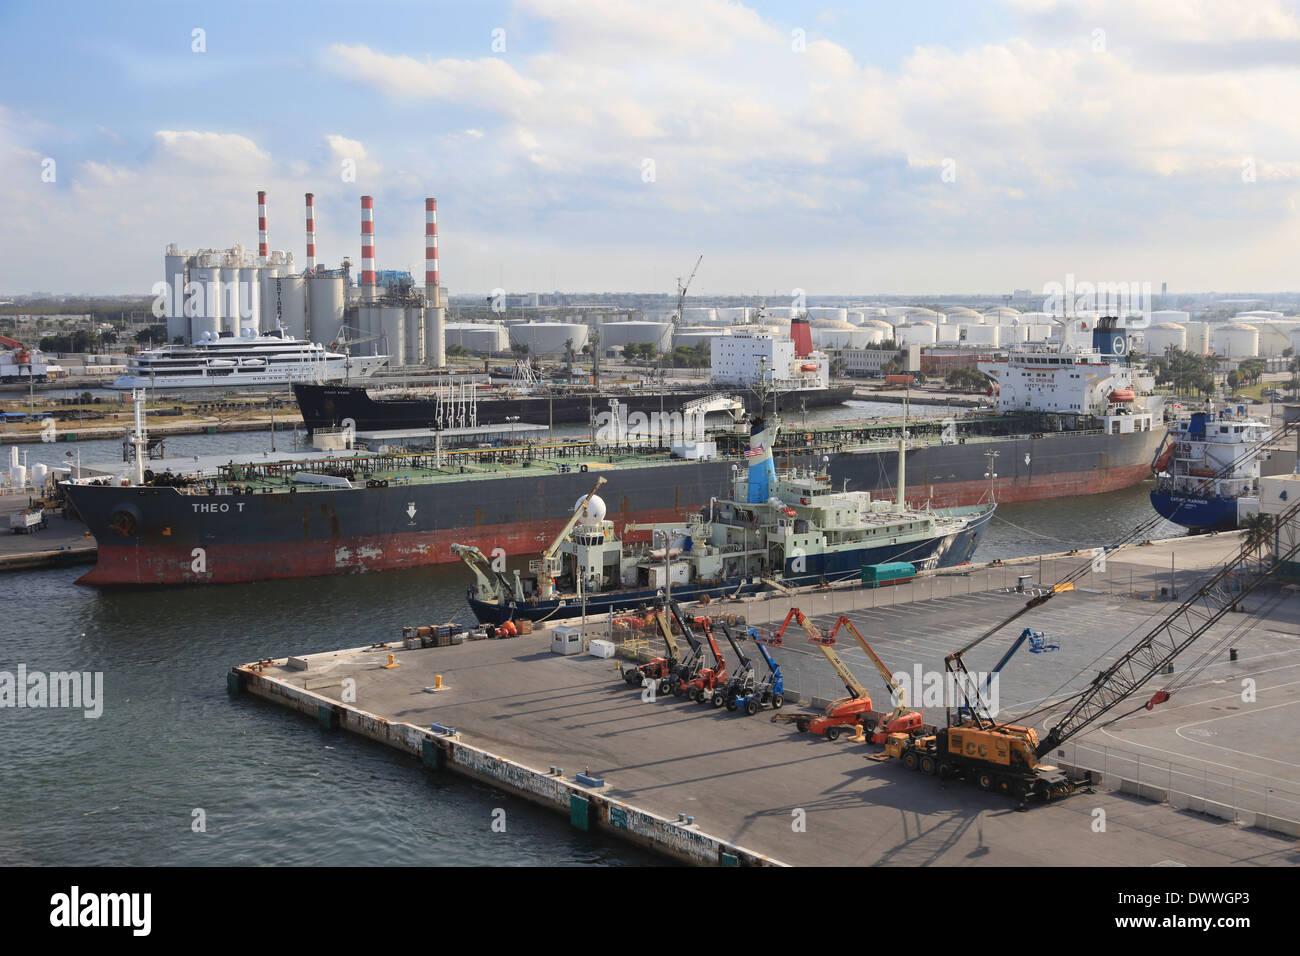 Crude Oil tanker THEO T docked in Port Everglades harbor Florida - Stock Image